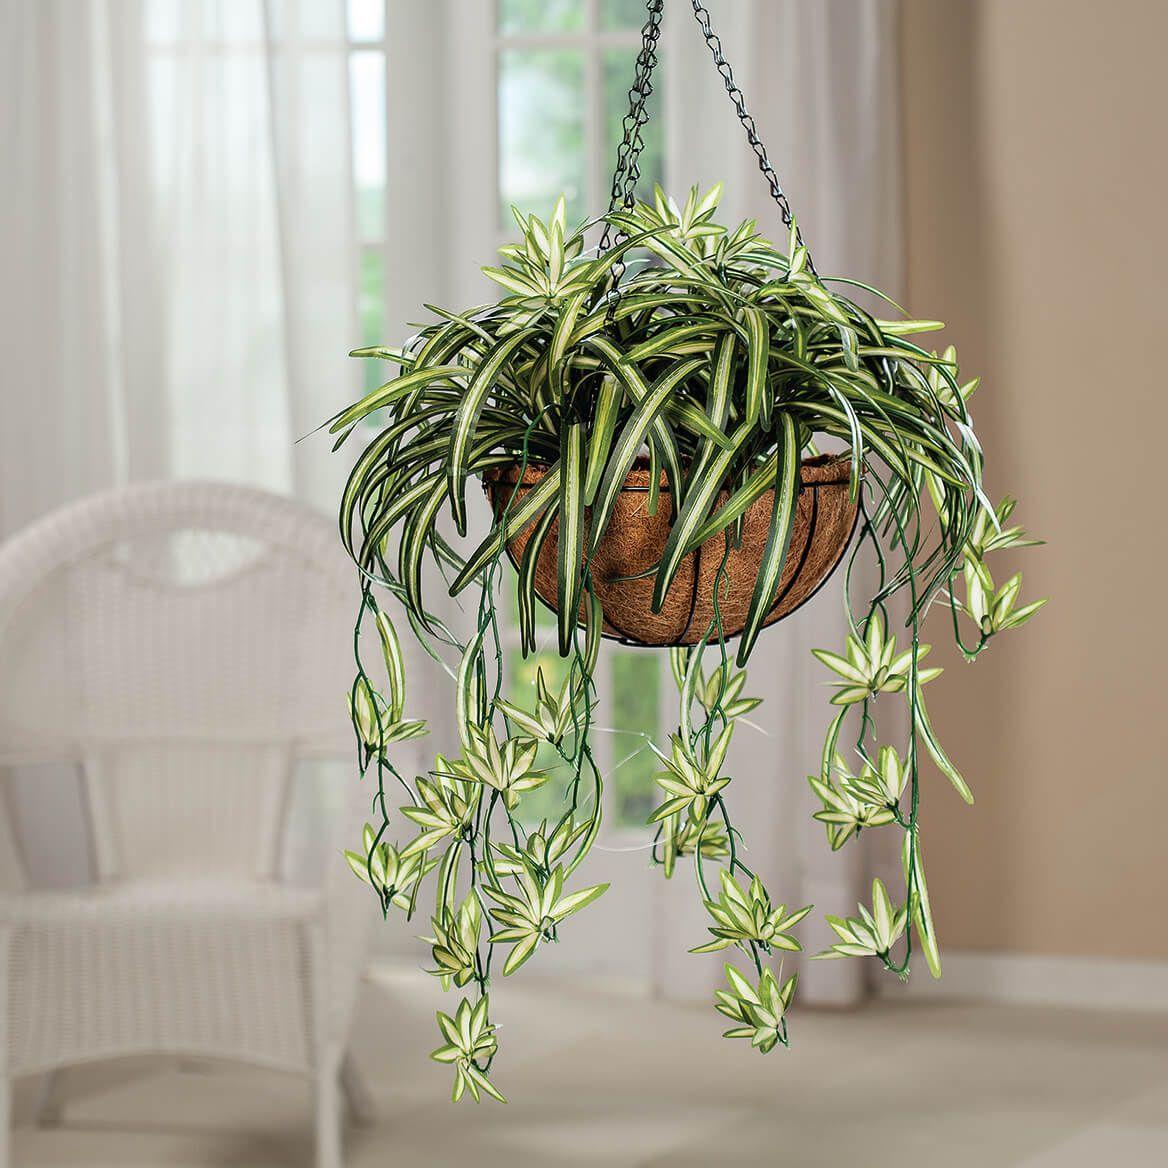 Fully Assembled Spider Basket by OakRidge™-369042